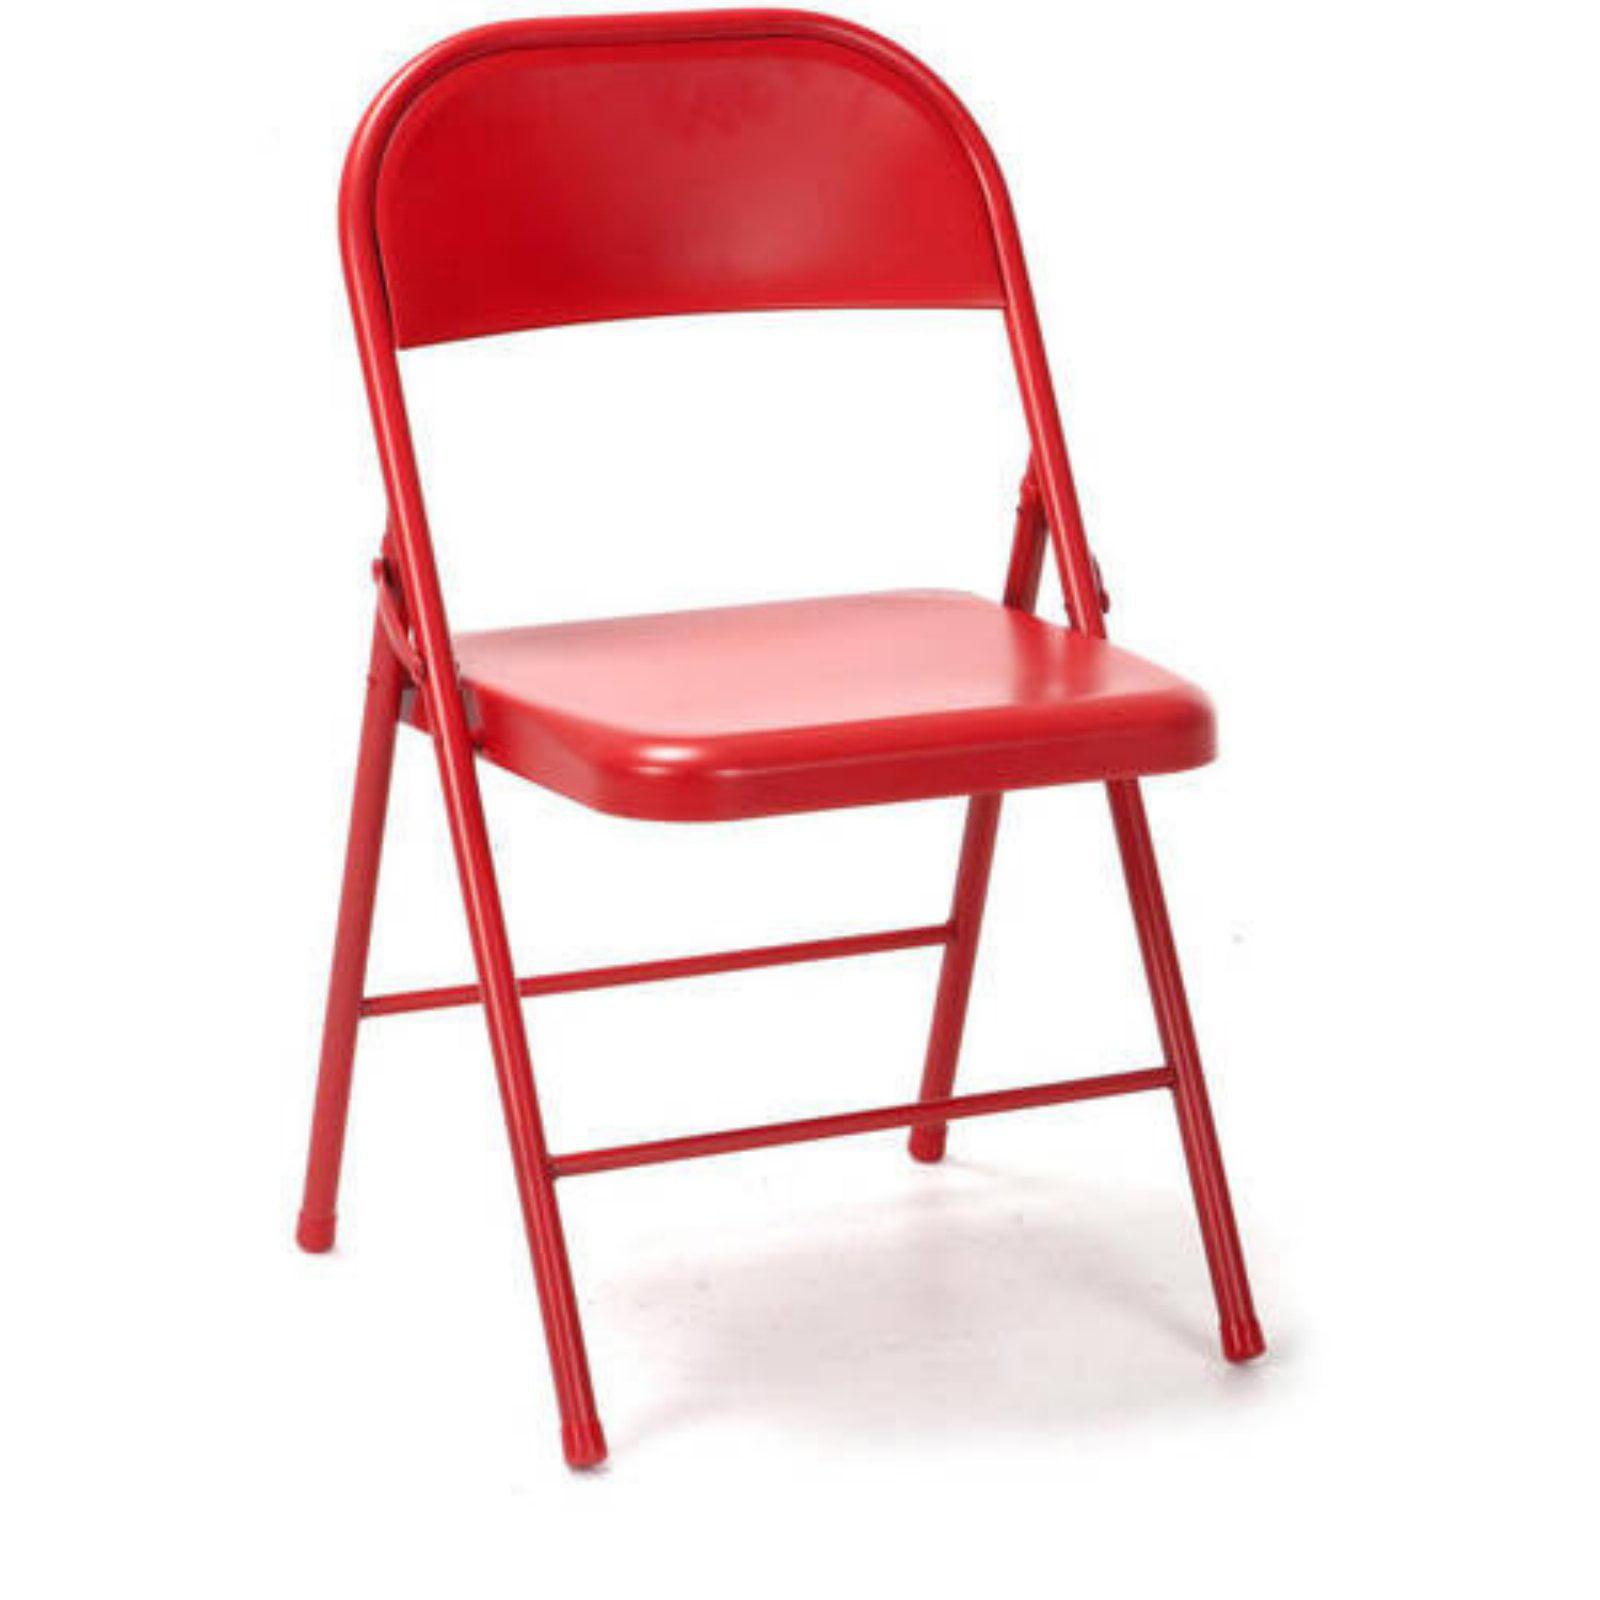 Merveilleux Novogratz All Steel Folding Chair, 2 Pack, Multiple Colors   Walmart.com